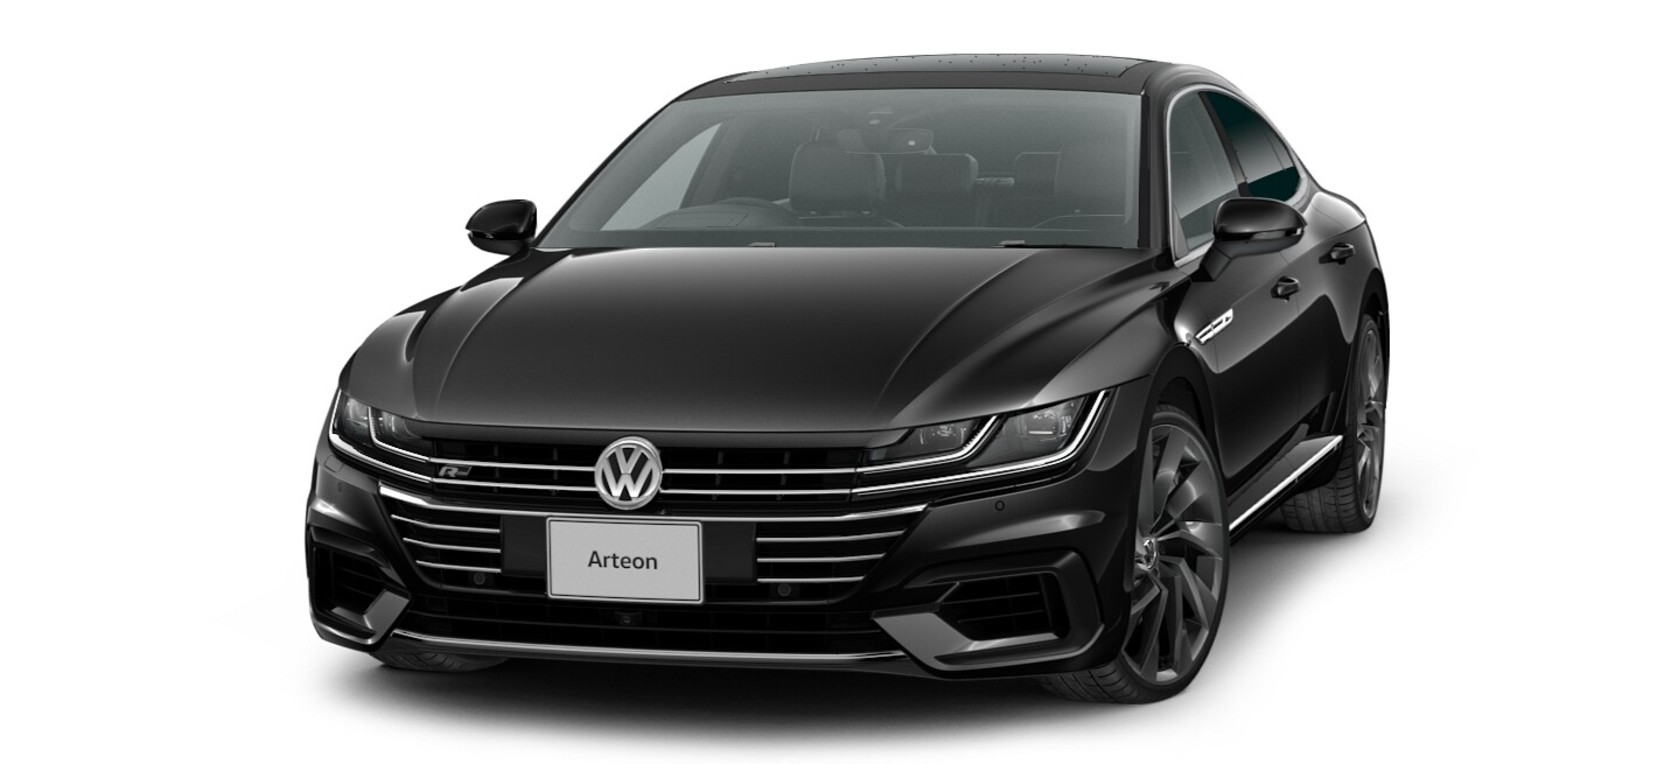 New Arteon R-Line 4MOTION Advanceラグジュアリーパッケージ装着車の画像1